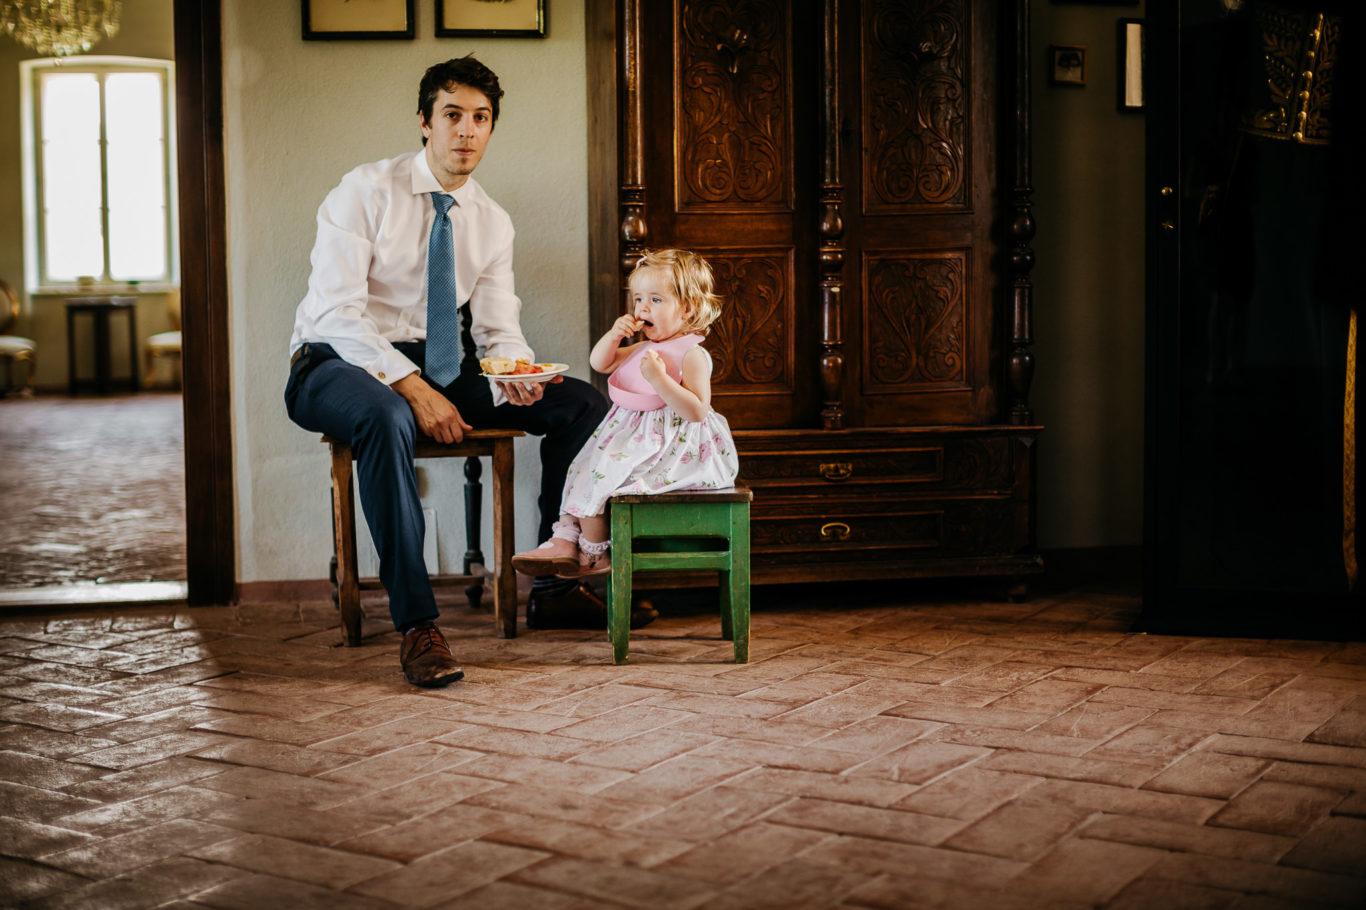 0331-fotografie-nunta-conacul-apafi-ana-simion-fotograf-ciprian-dumitrescu-dc1_0299